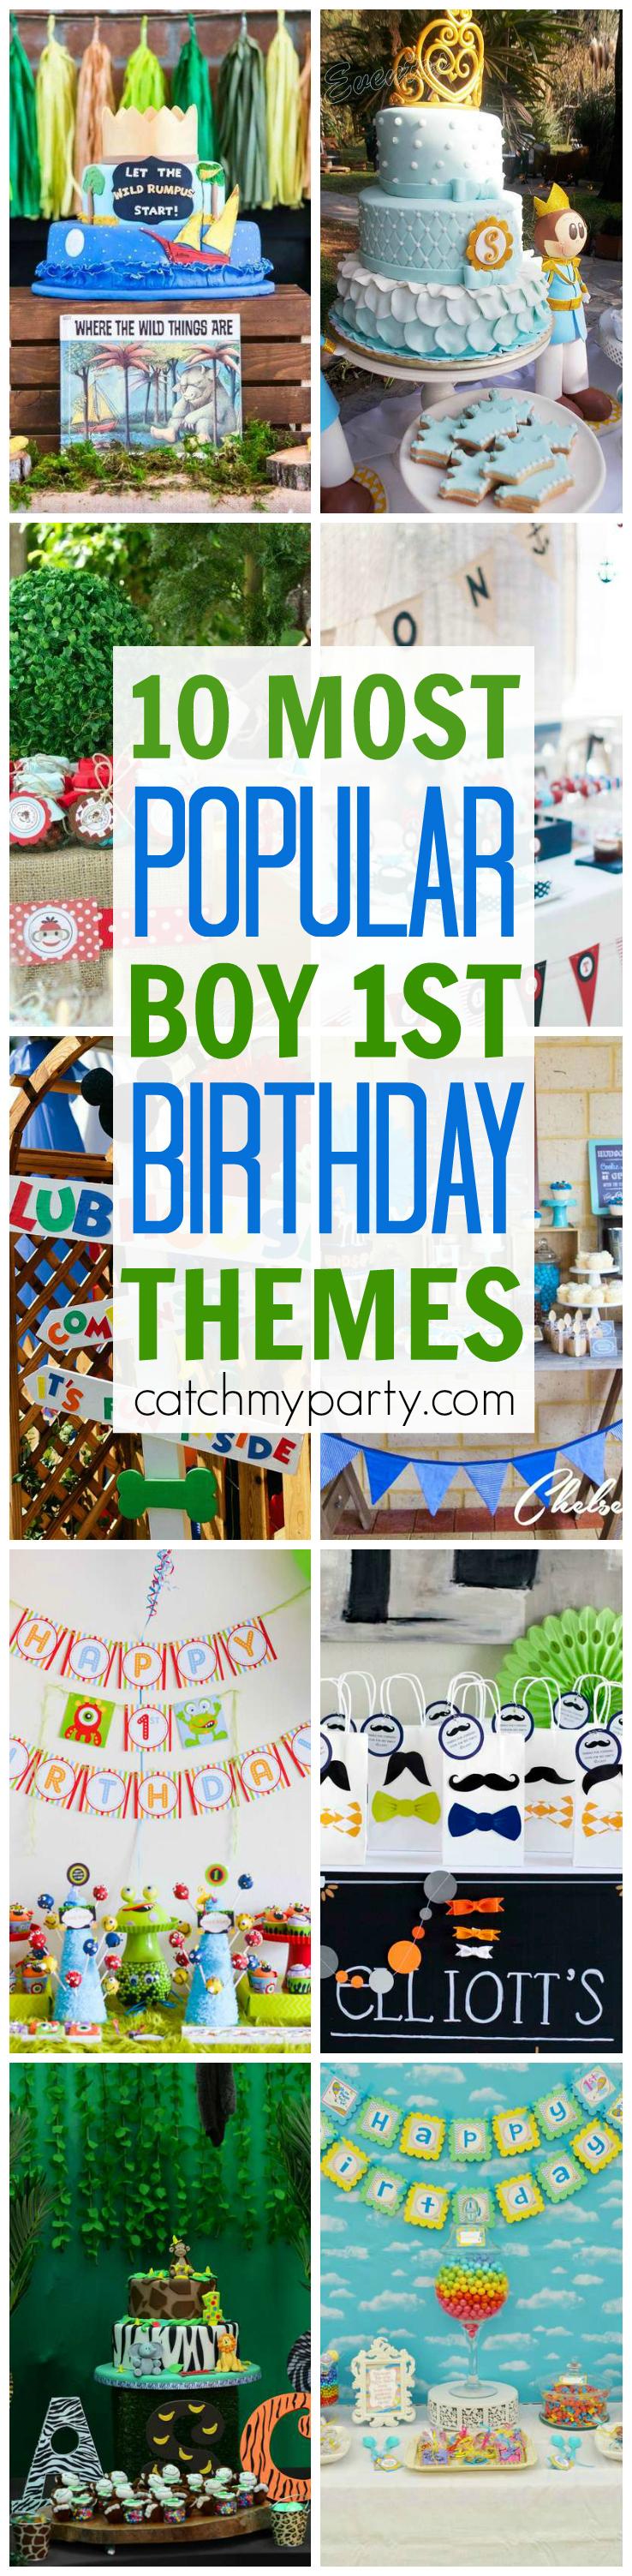 10 Most Popular Boy 1st Birthday Party Themes